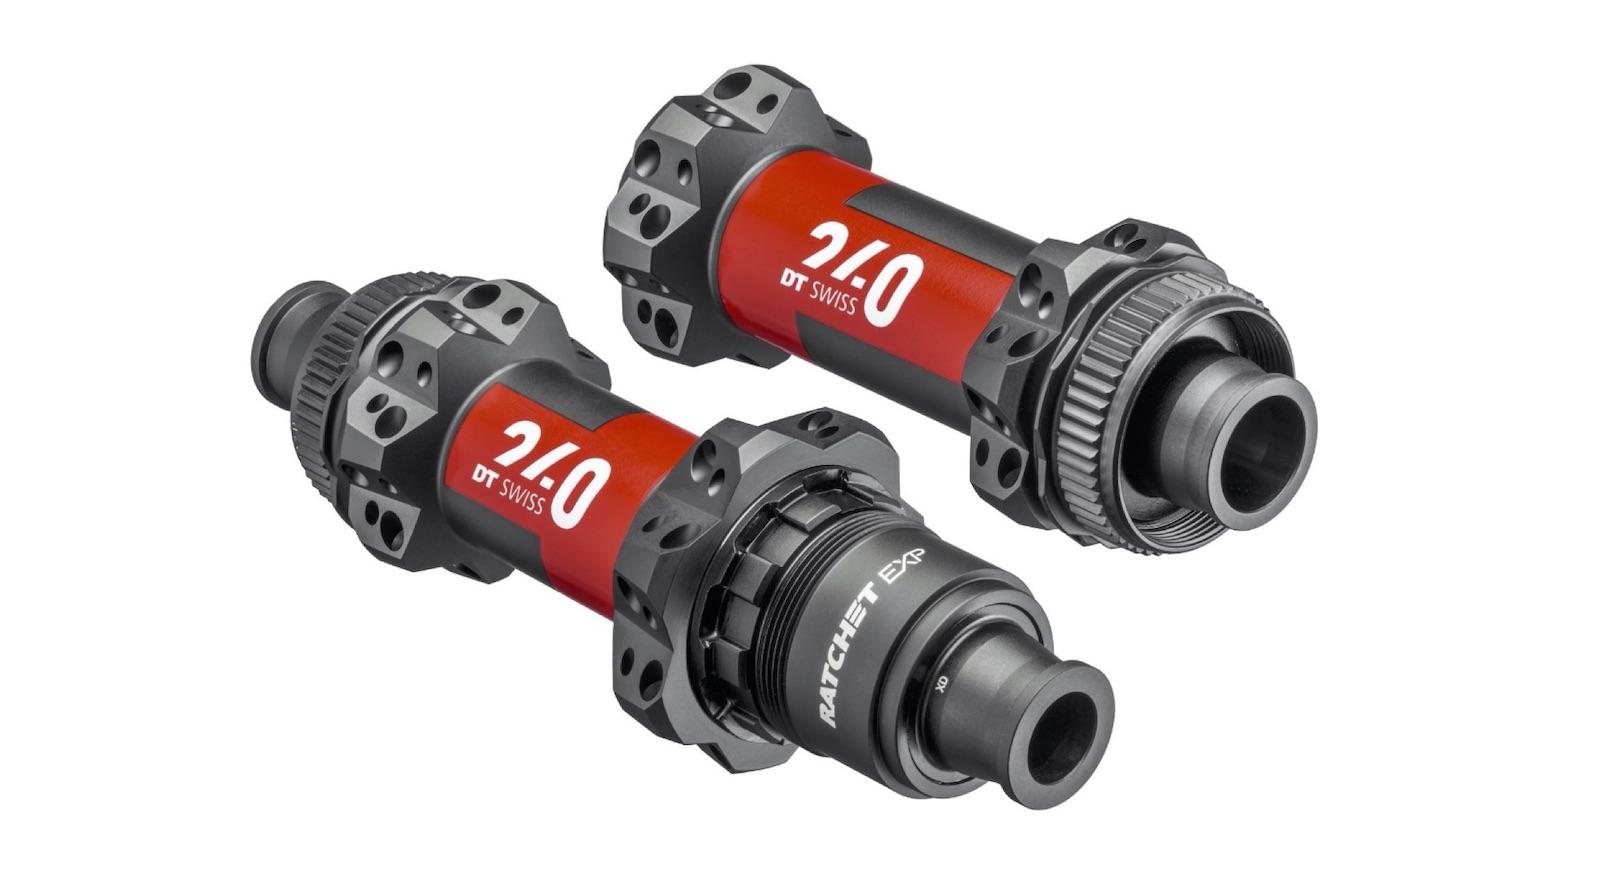 DT Swiss 240 EXP (15000,-)